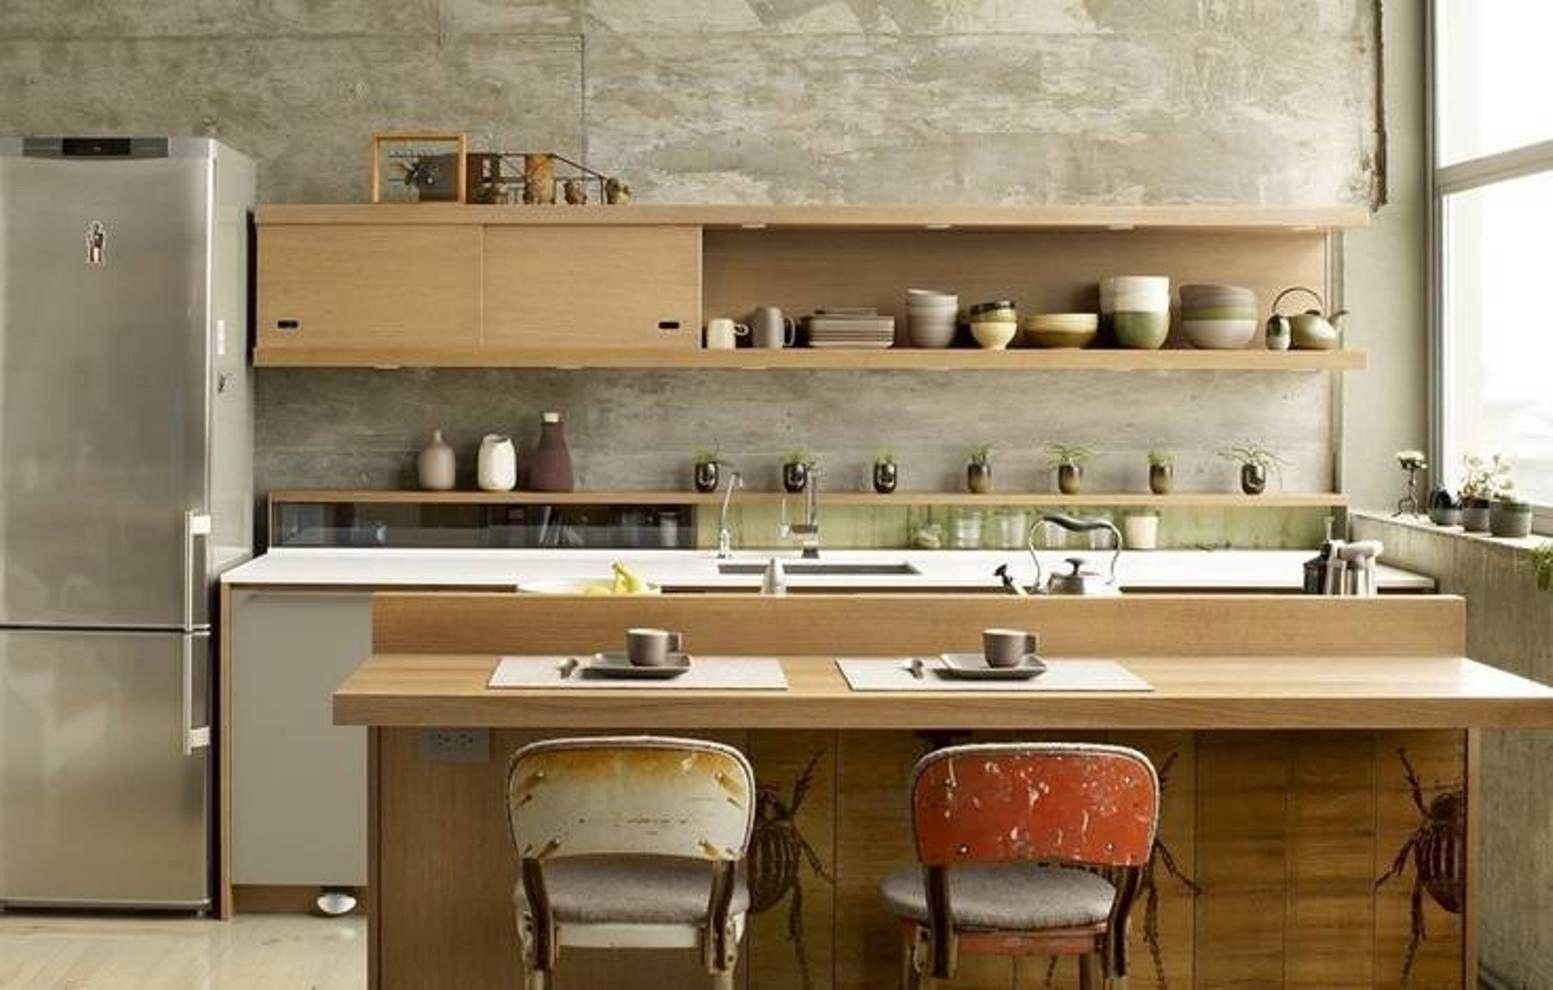 Japanese Kitchen Design Style - Home Architec Ideas in 7